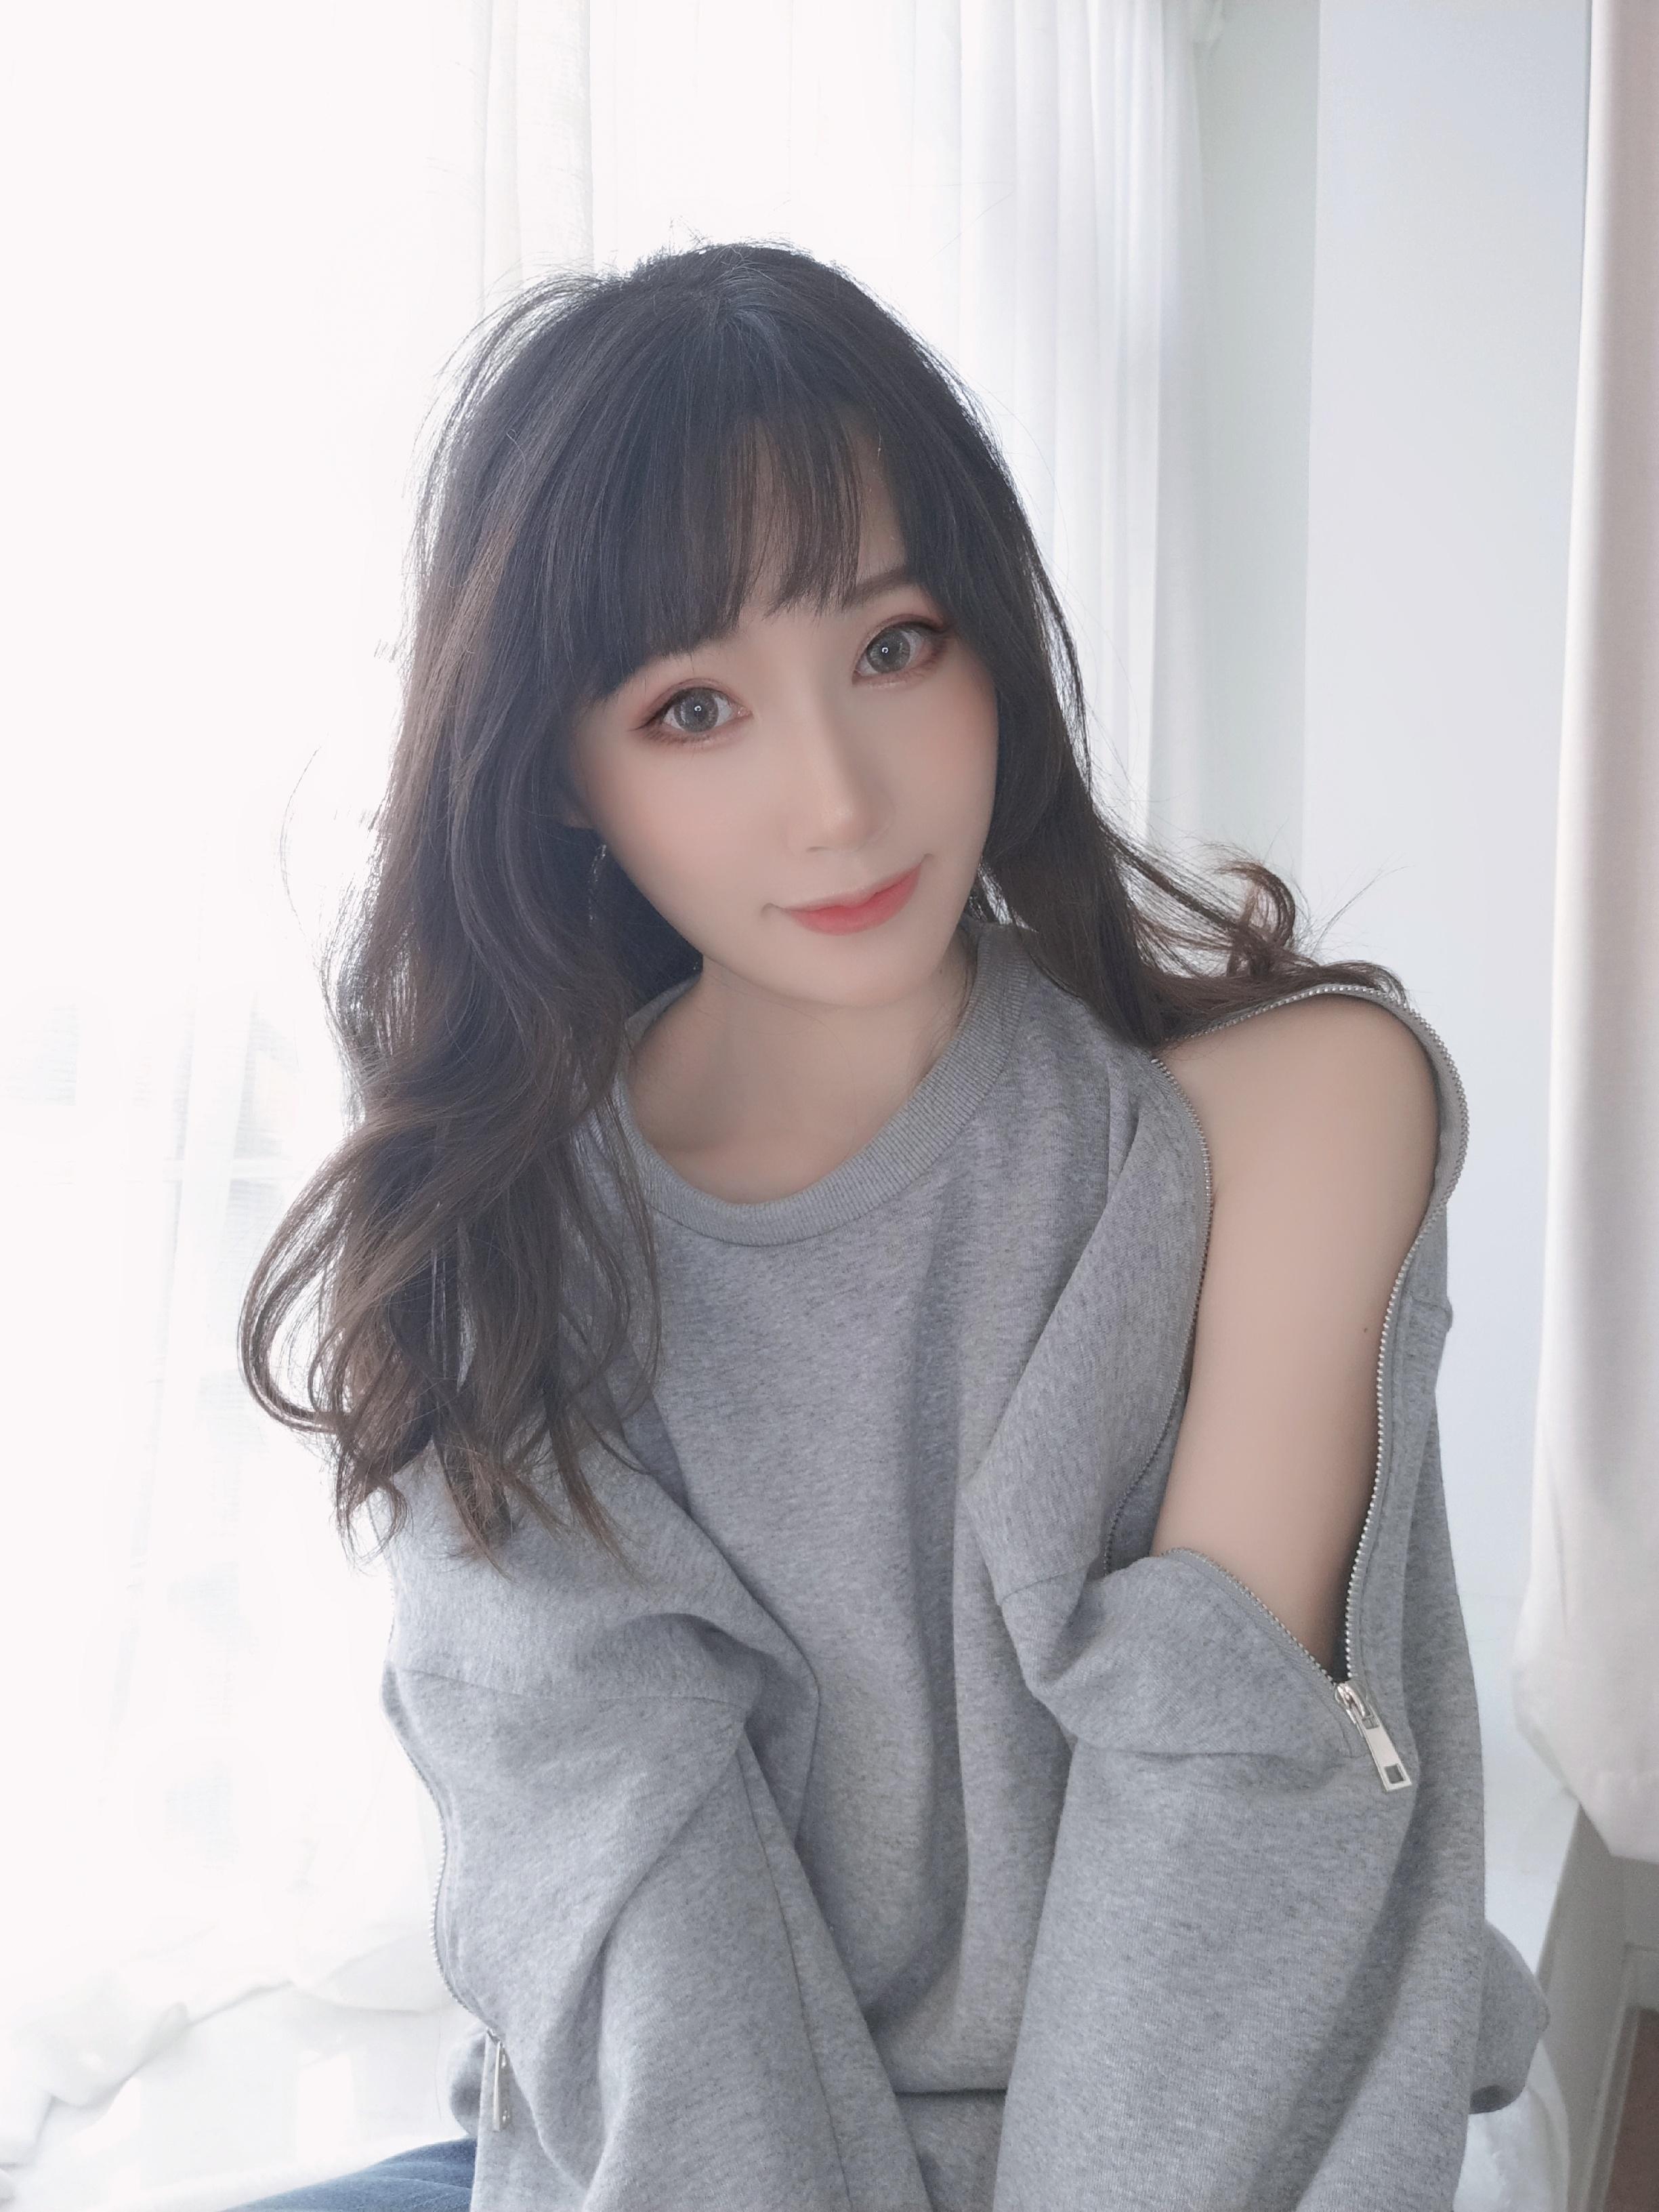 宅男咪zhainanmi.net (12)